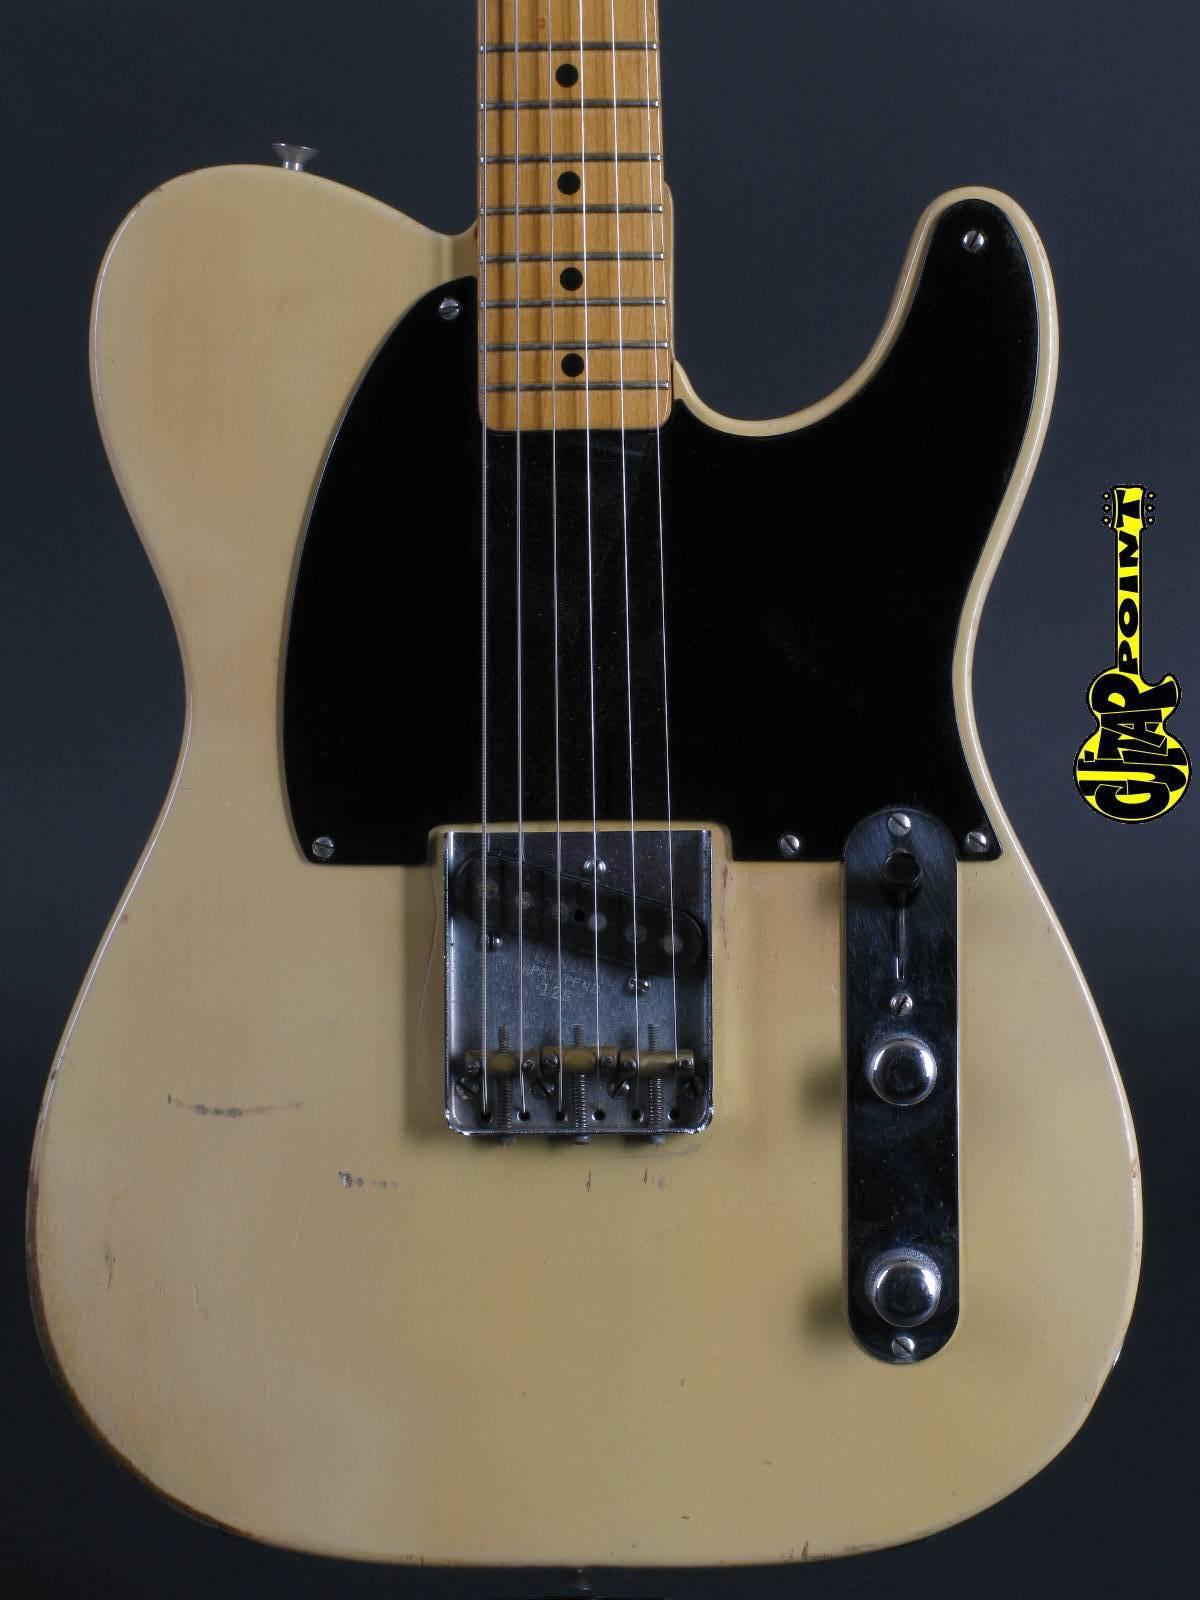 1951 Fender Esquire (Telecaster) - Blond